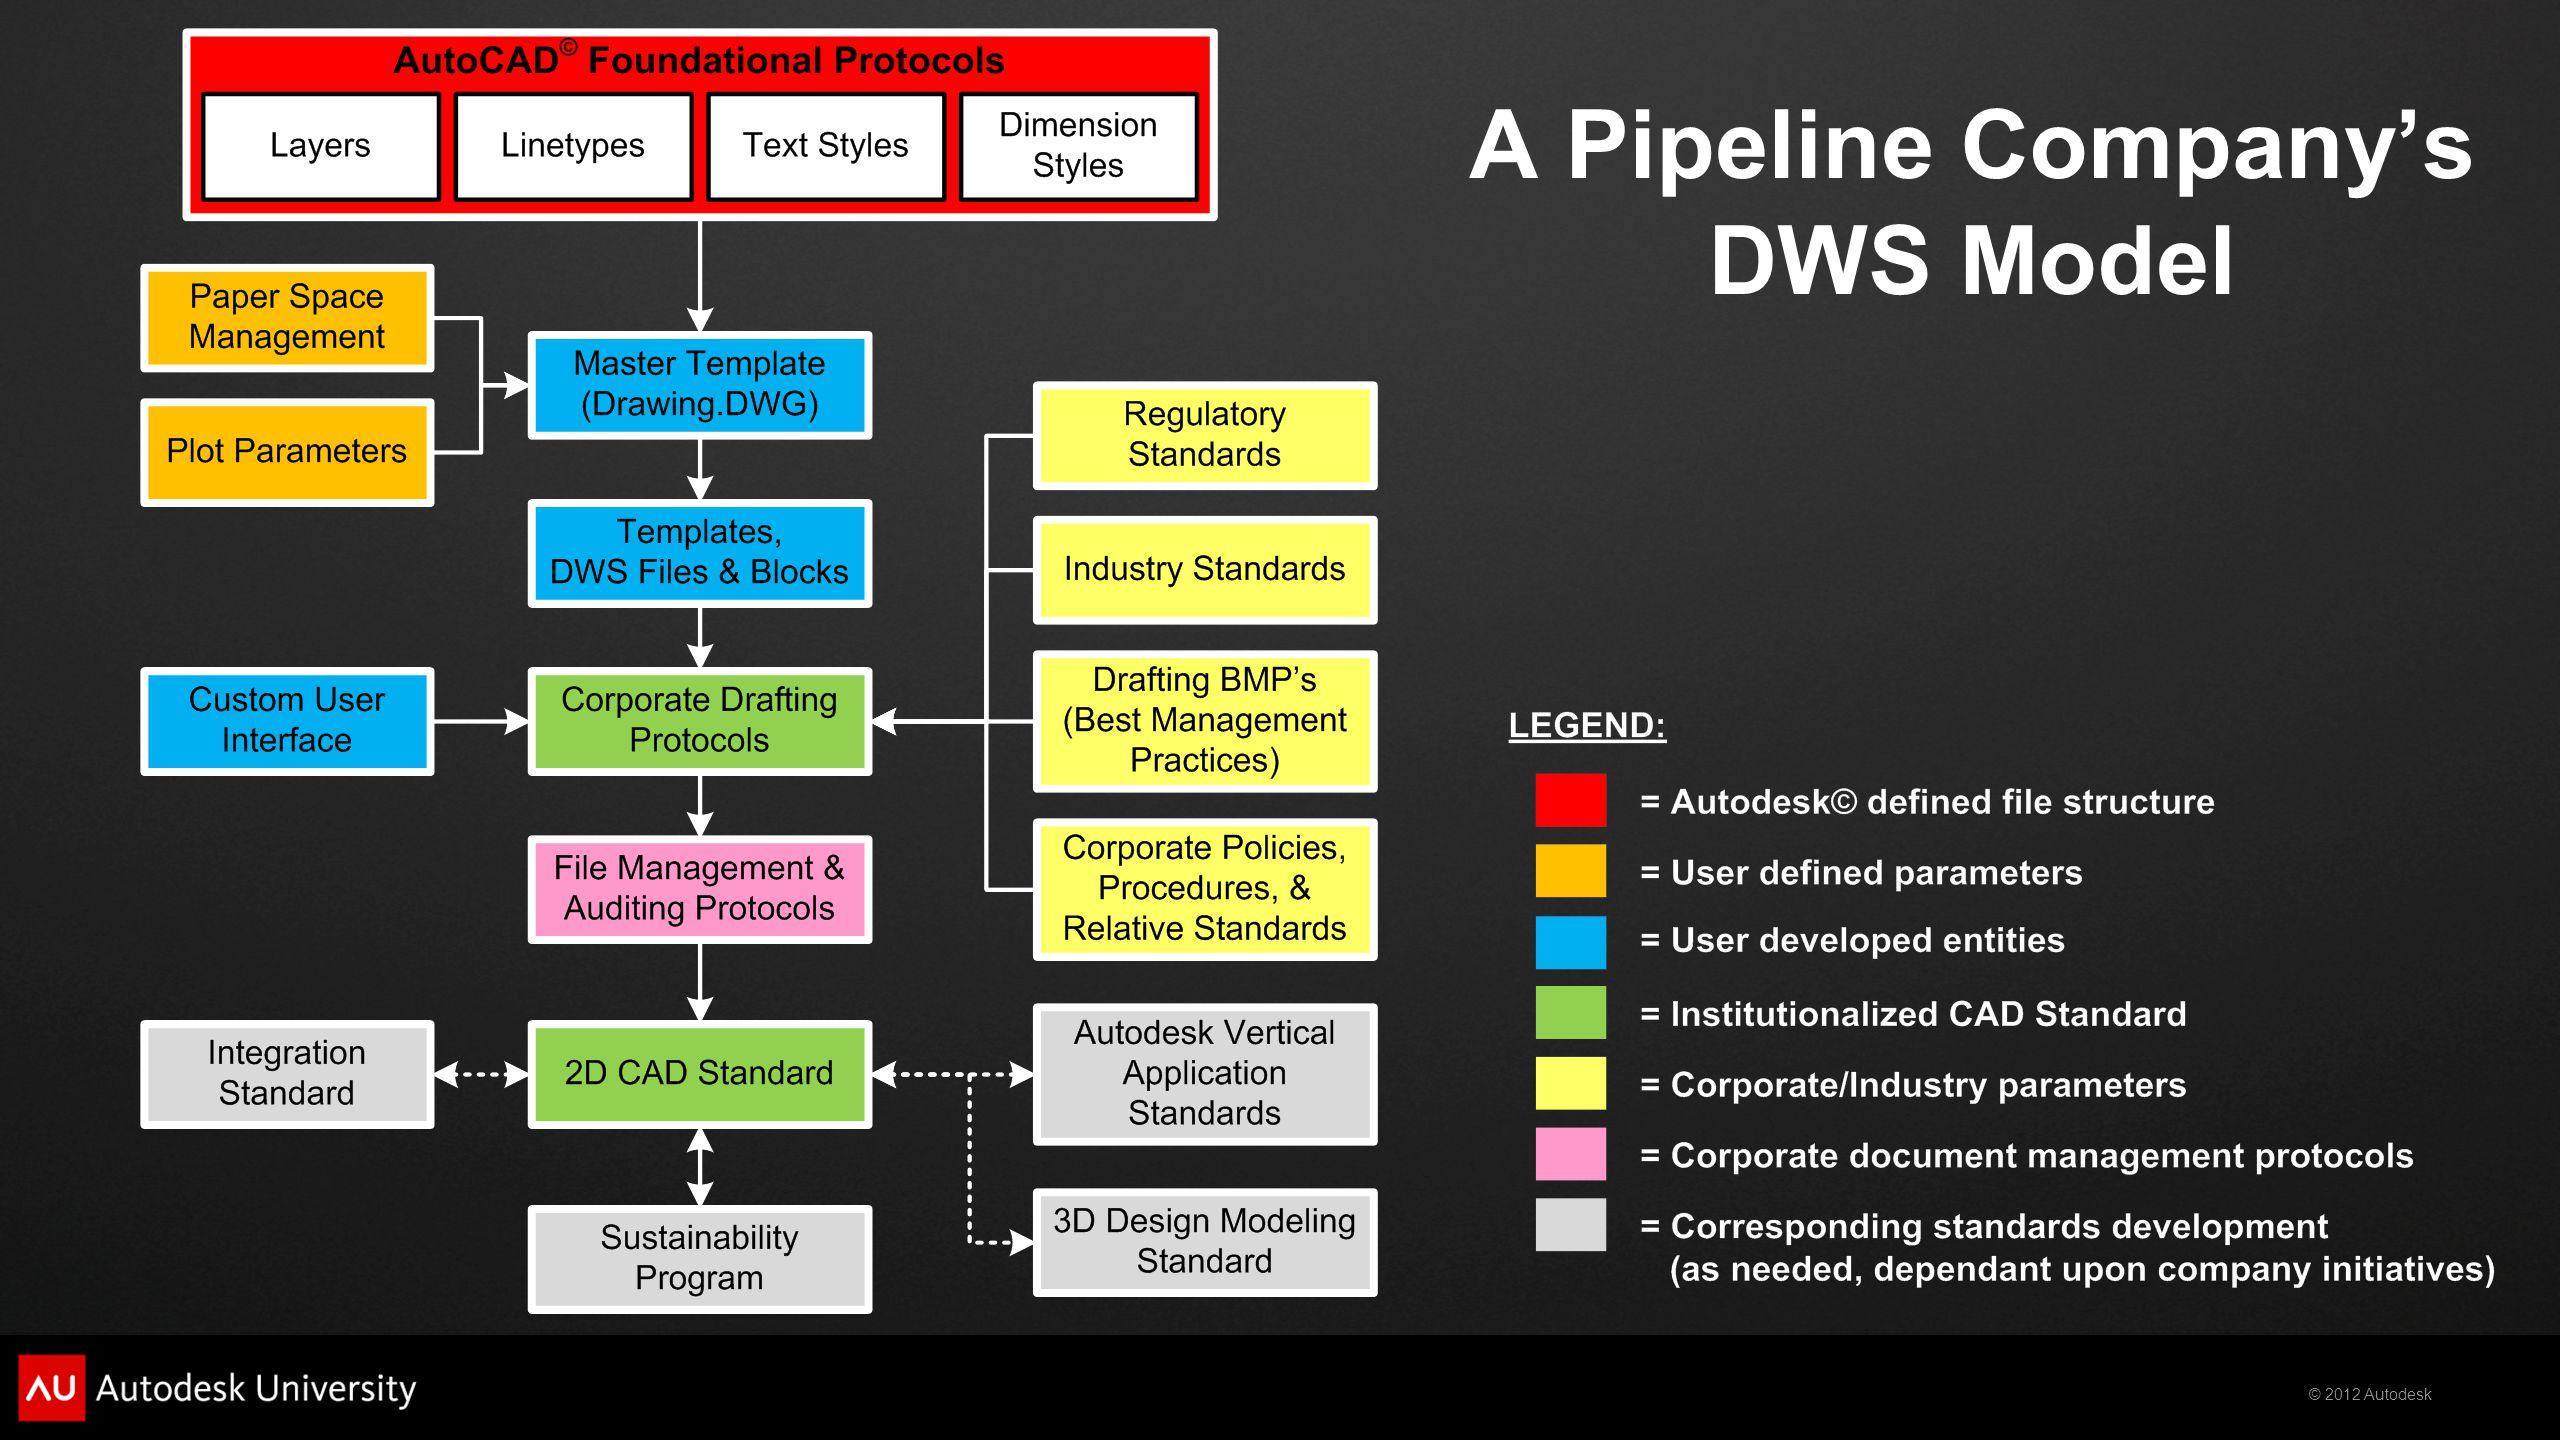 © 2012 Autodesk A Pipeline Company's DWS Model